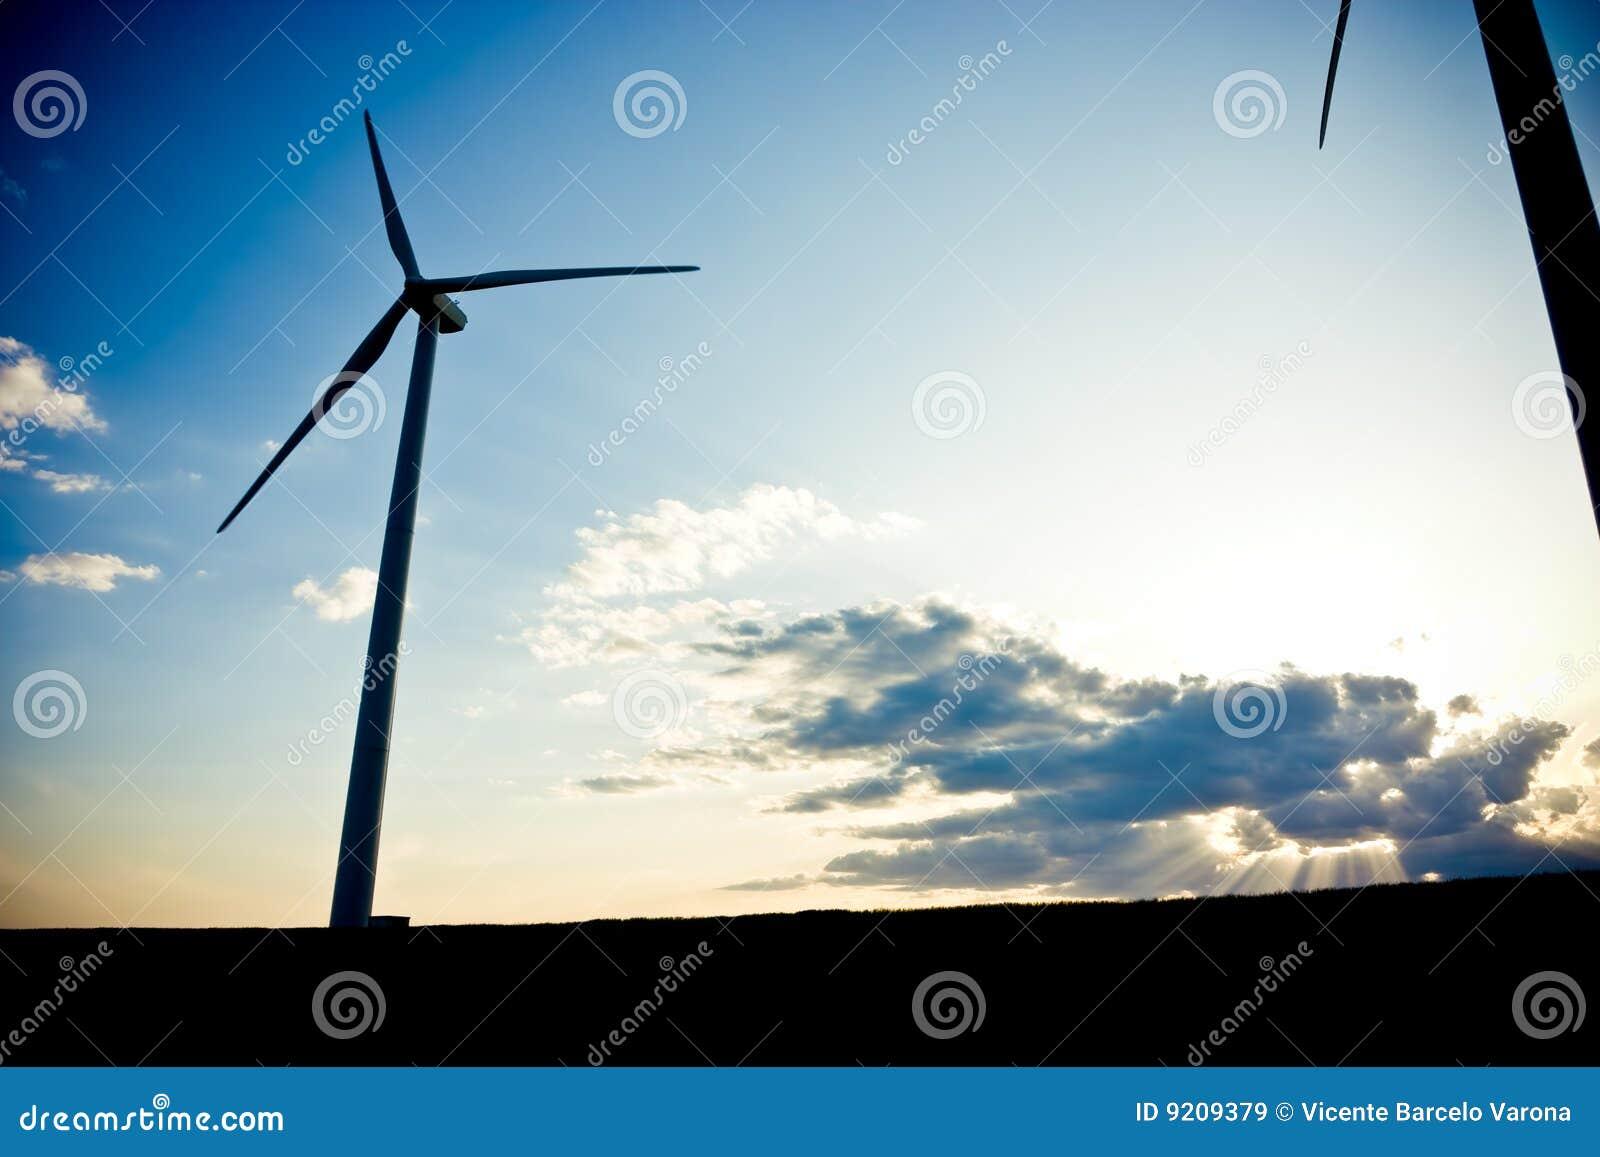 Silueta del molino de viento